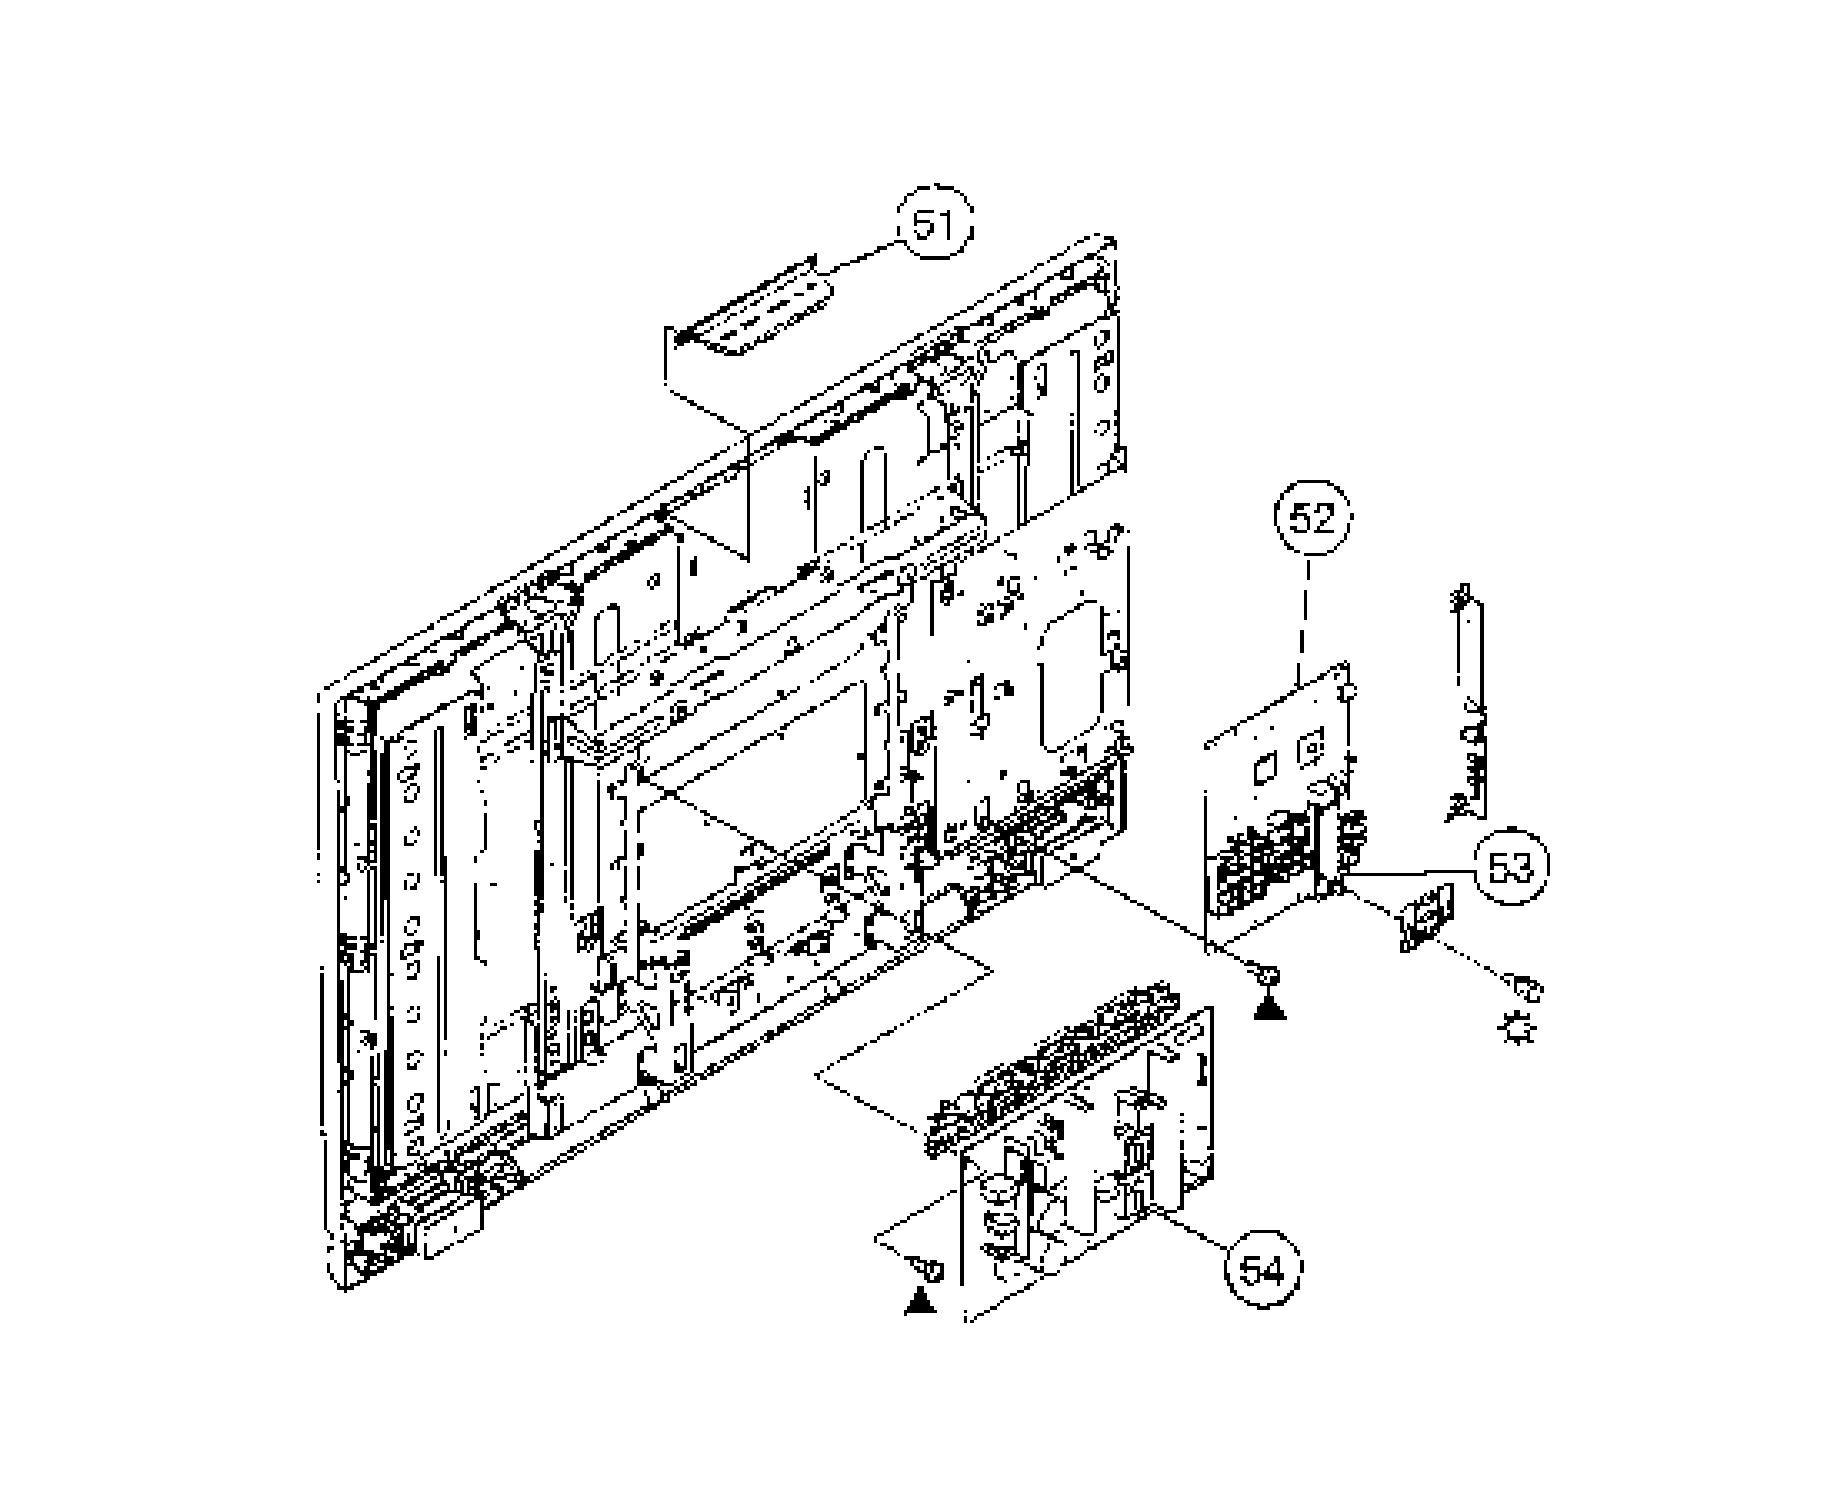 Sony model KDL-42V4100 lcd television genuine parts